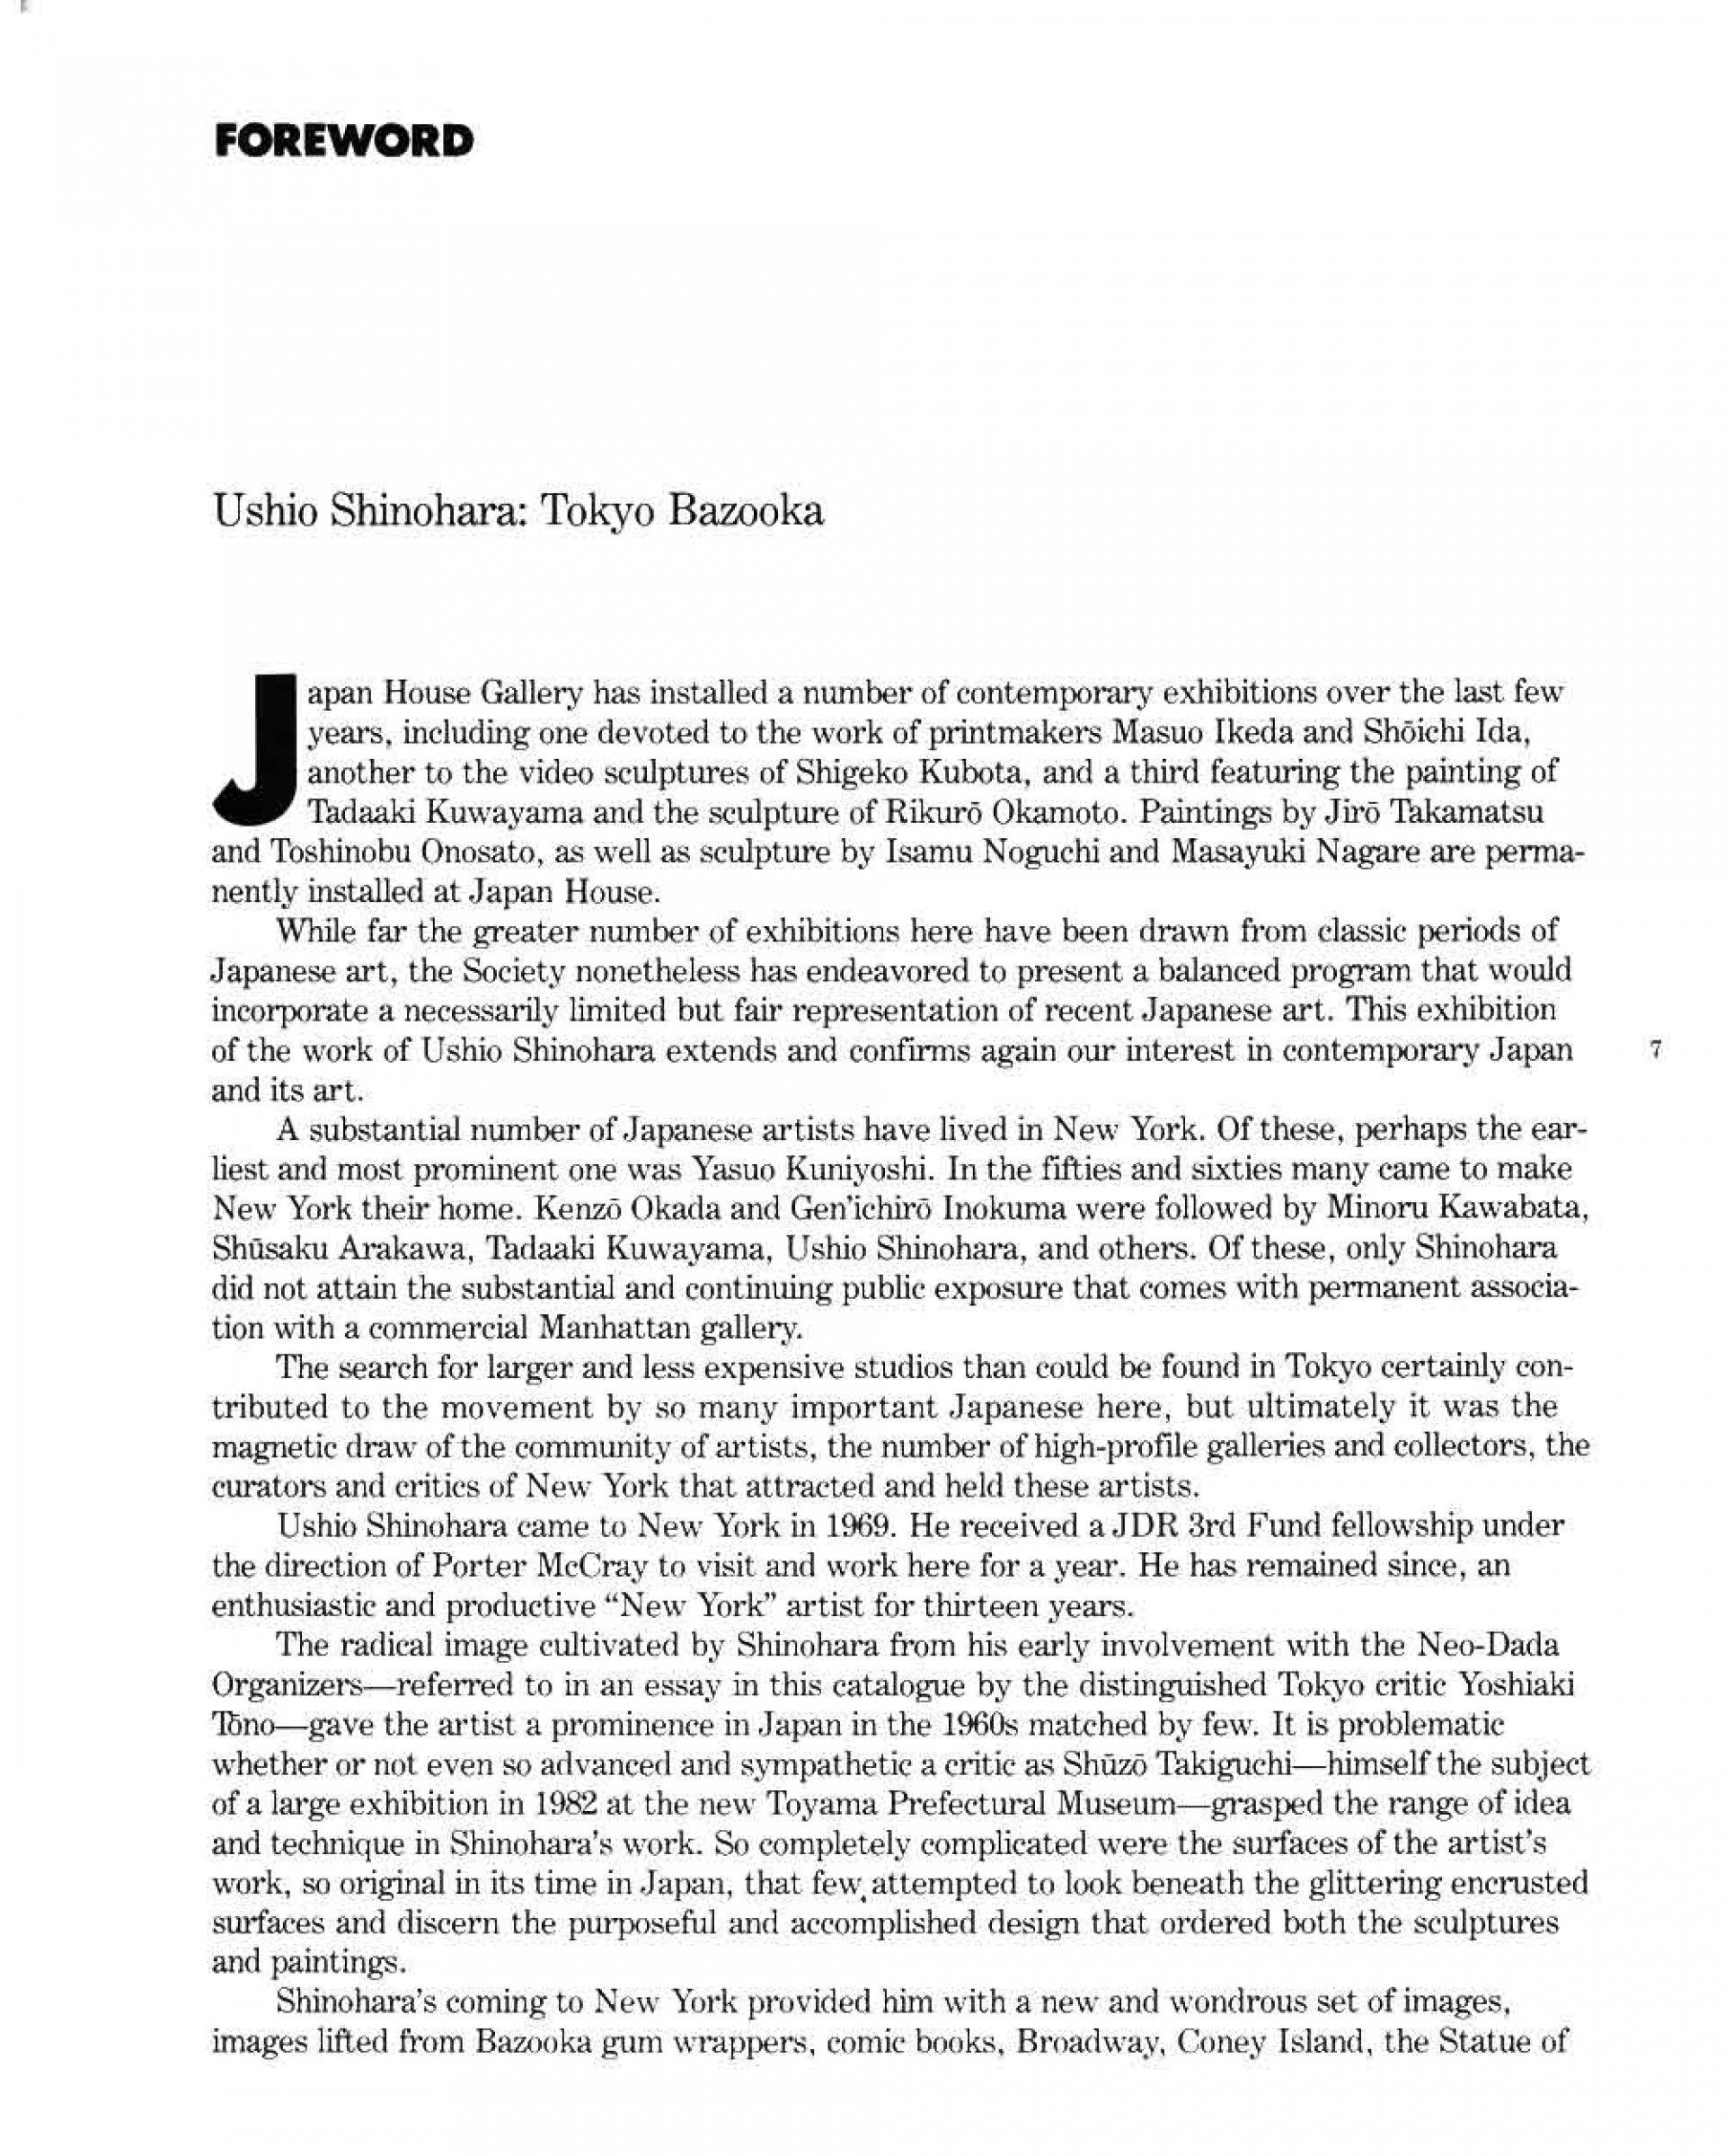 008 In Essay Citation Ushio Shinohara Tokyo Bazooka Pg 1 Striking Text Parenthetical Example Apa Multiple Authors Website 1920